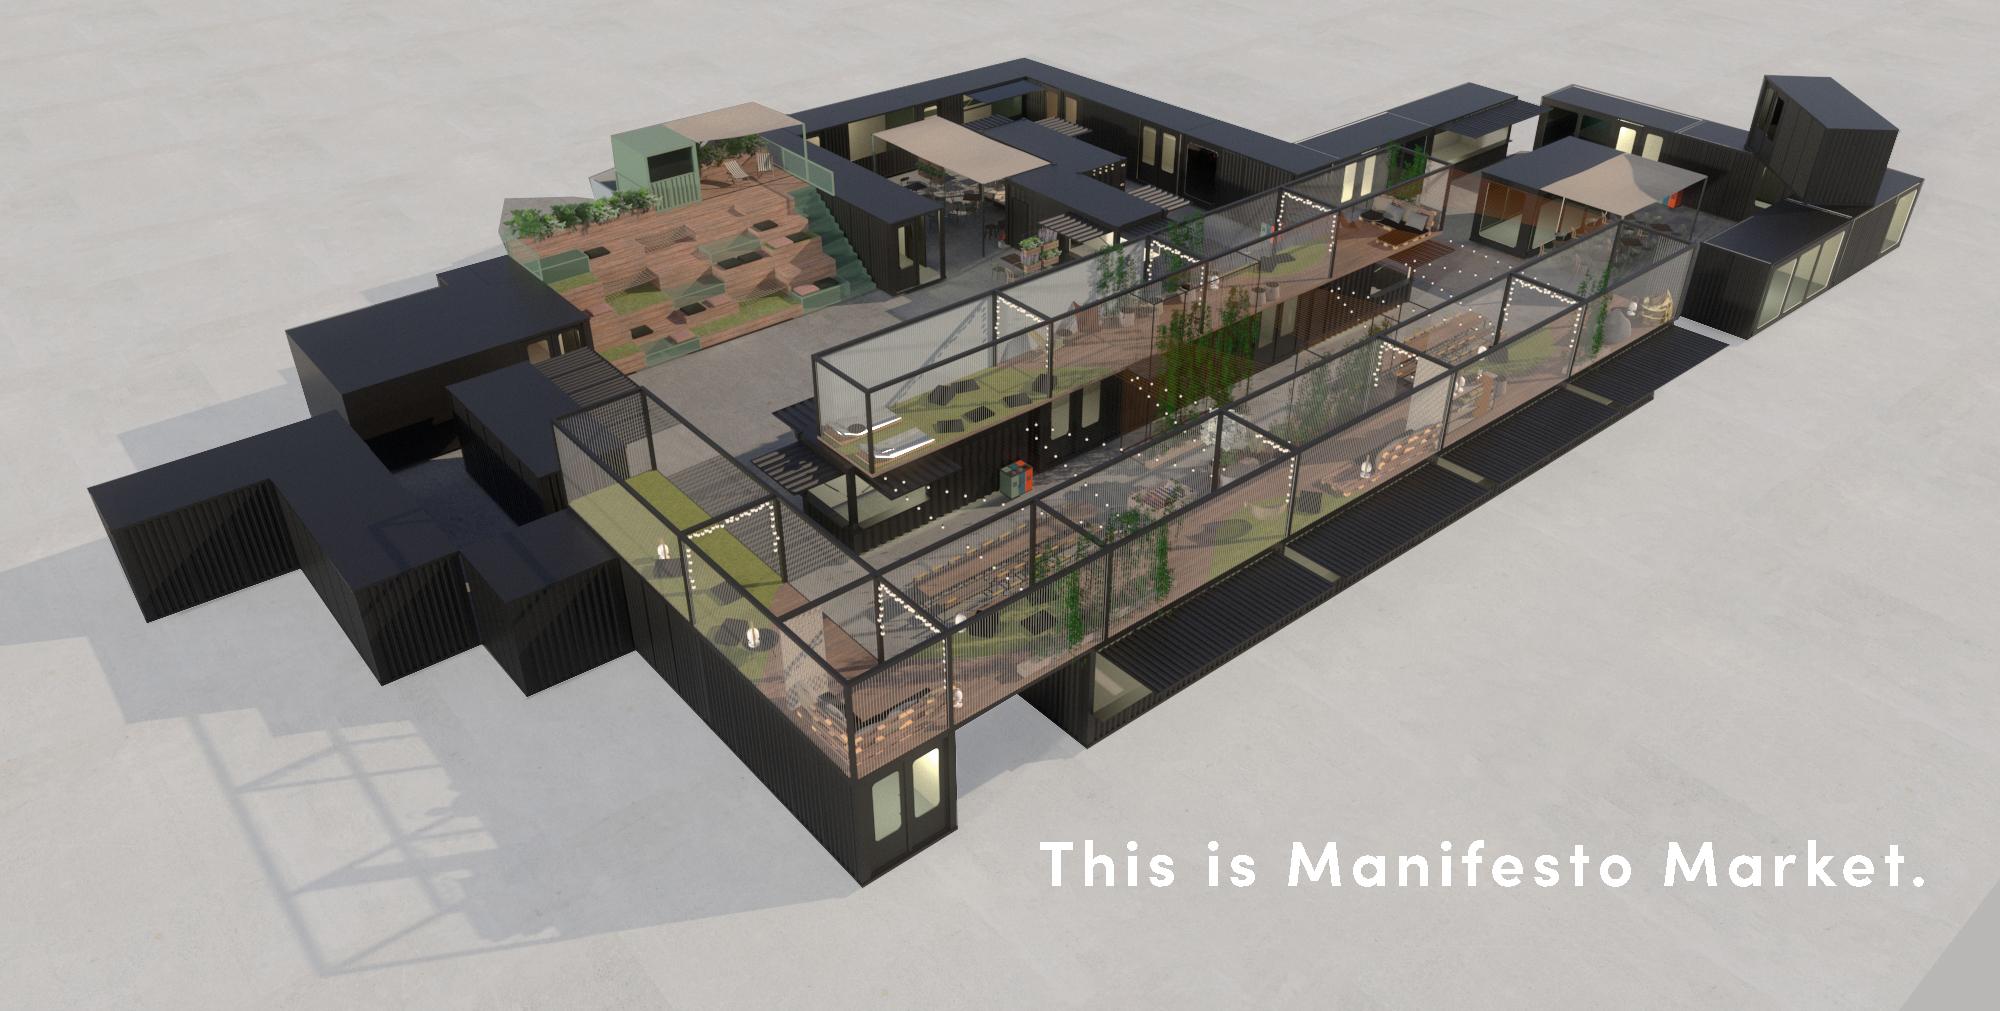 Manifesto plan - 1.jpg